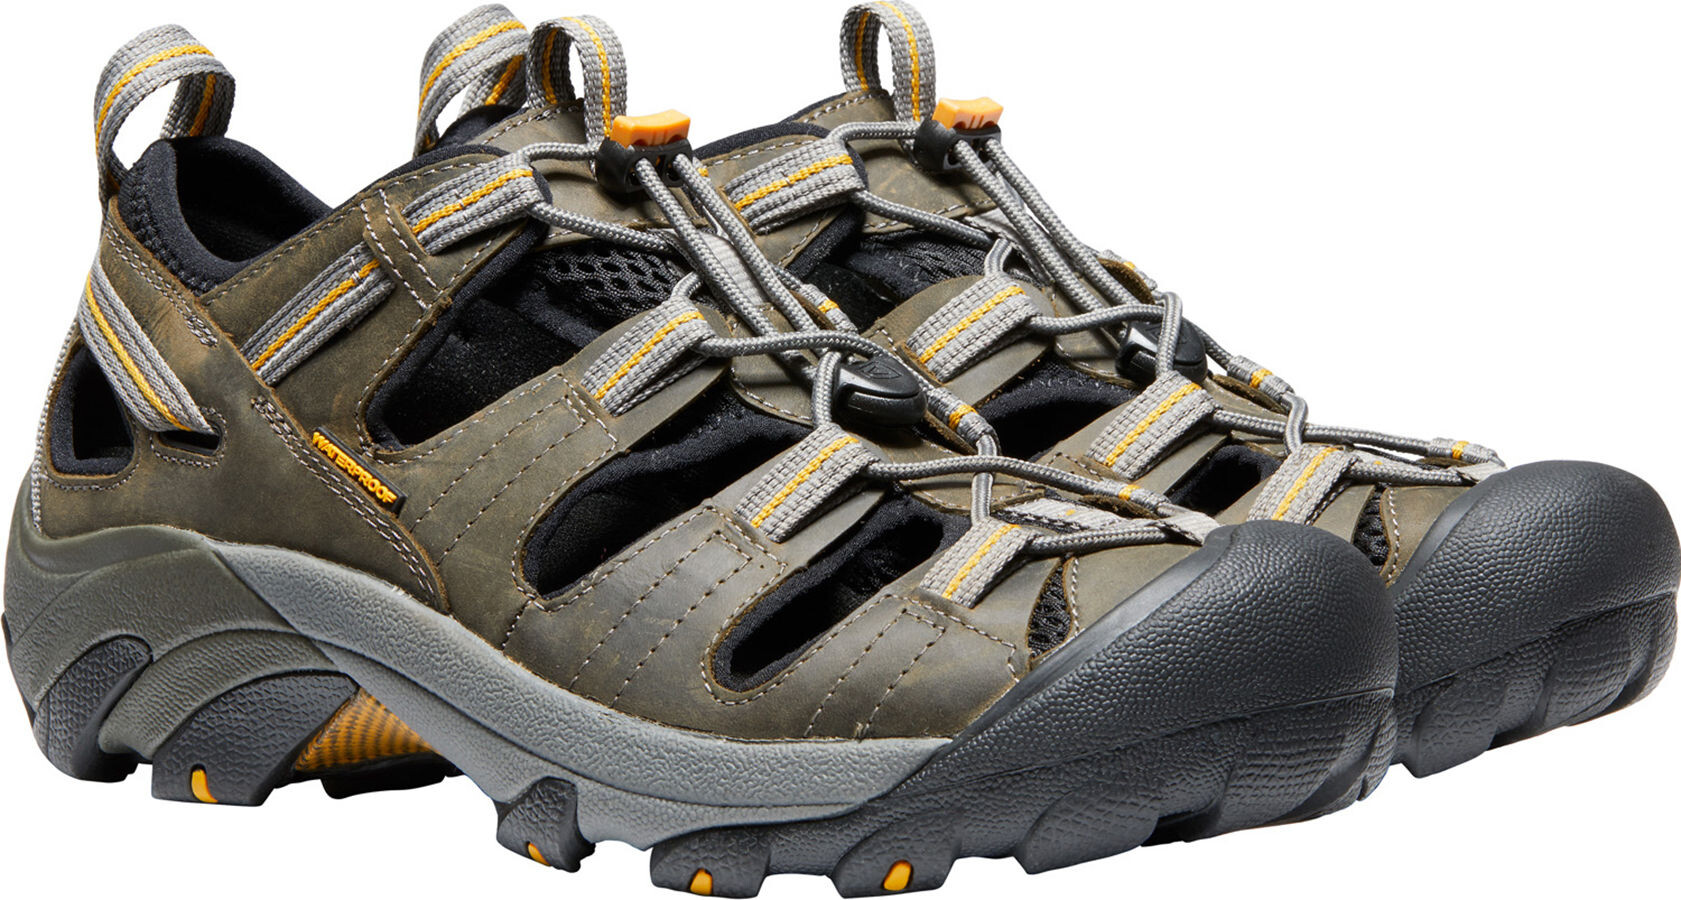 d0f5380fcd2 Keen Arroyo II Sandaler Herrer brun | Find outdoortøj, sko & udstyr ...